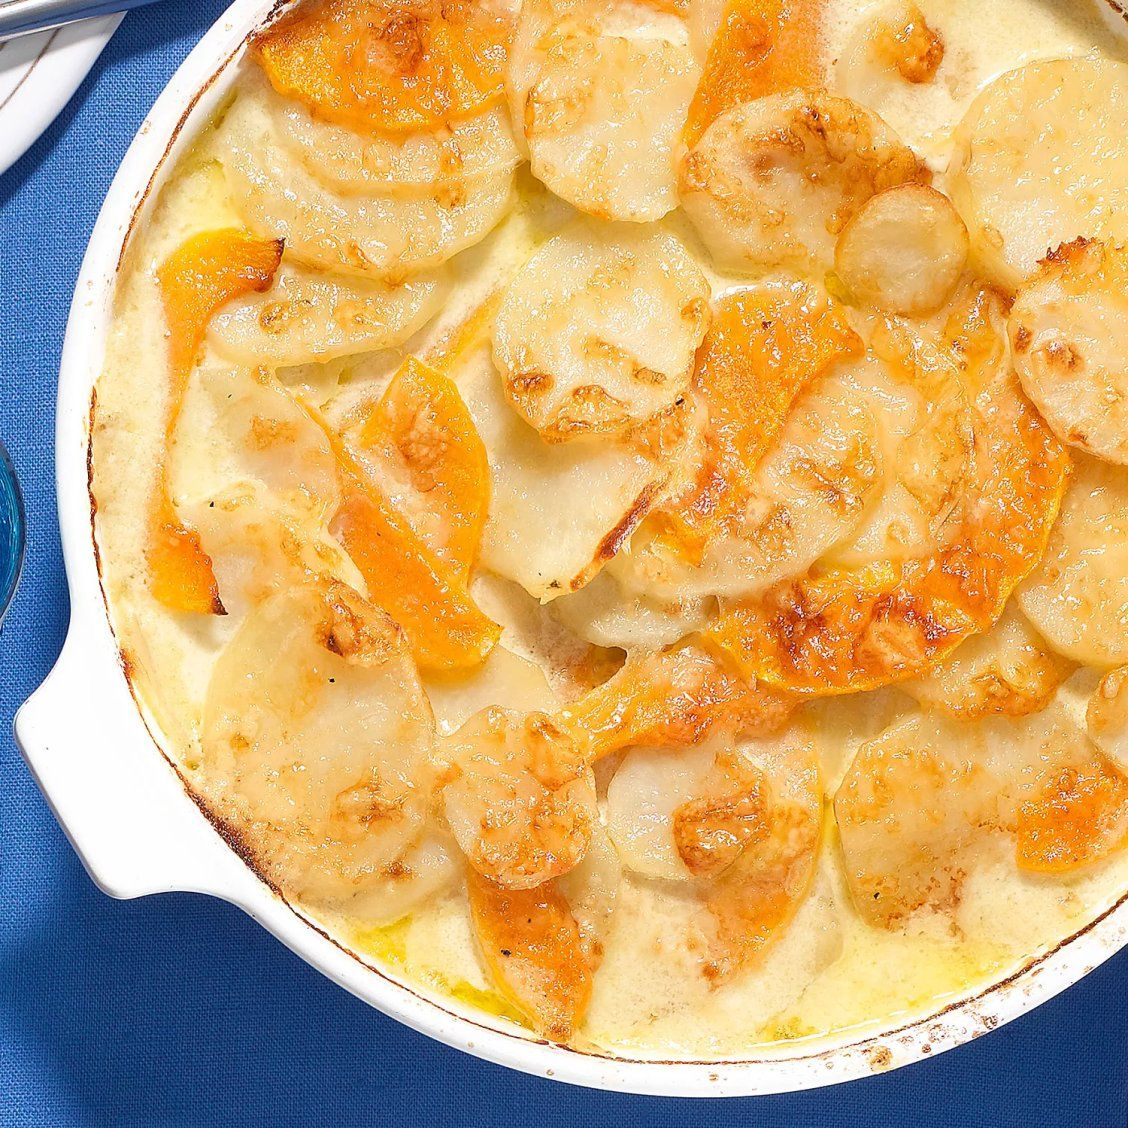 Scalloped Potatoes & Butternut Squash